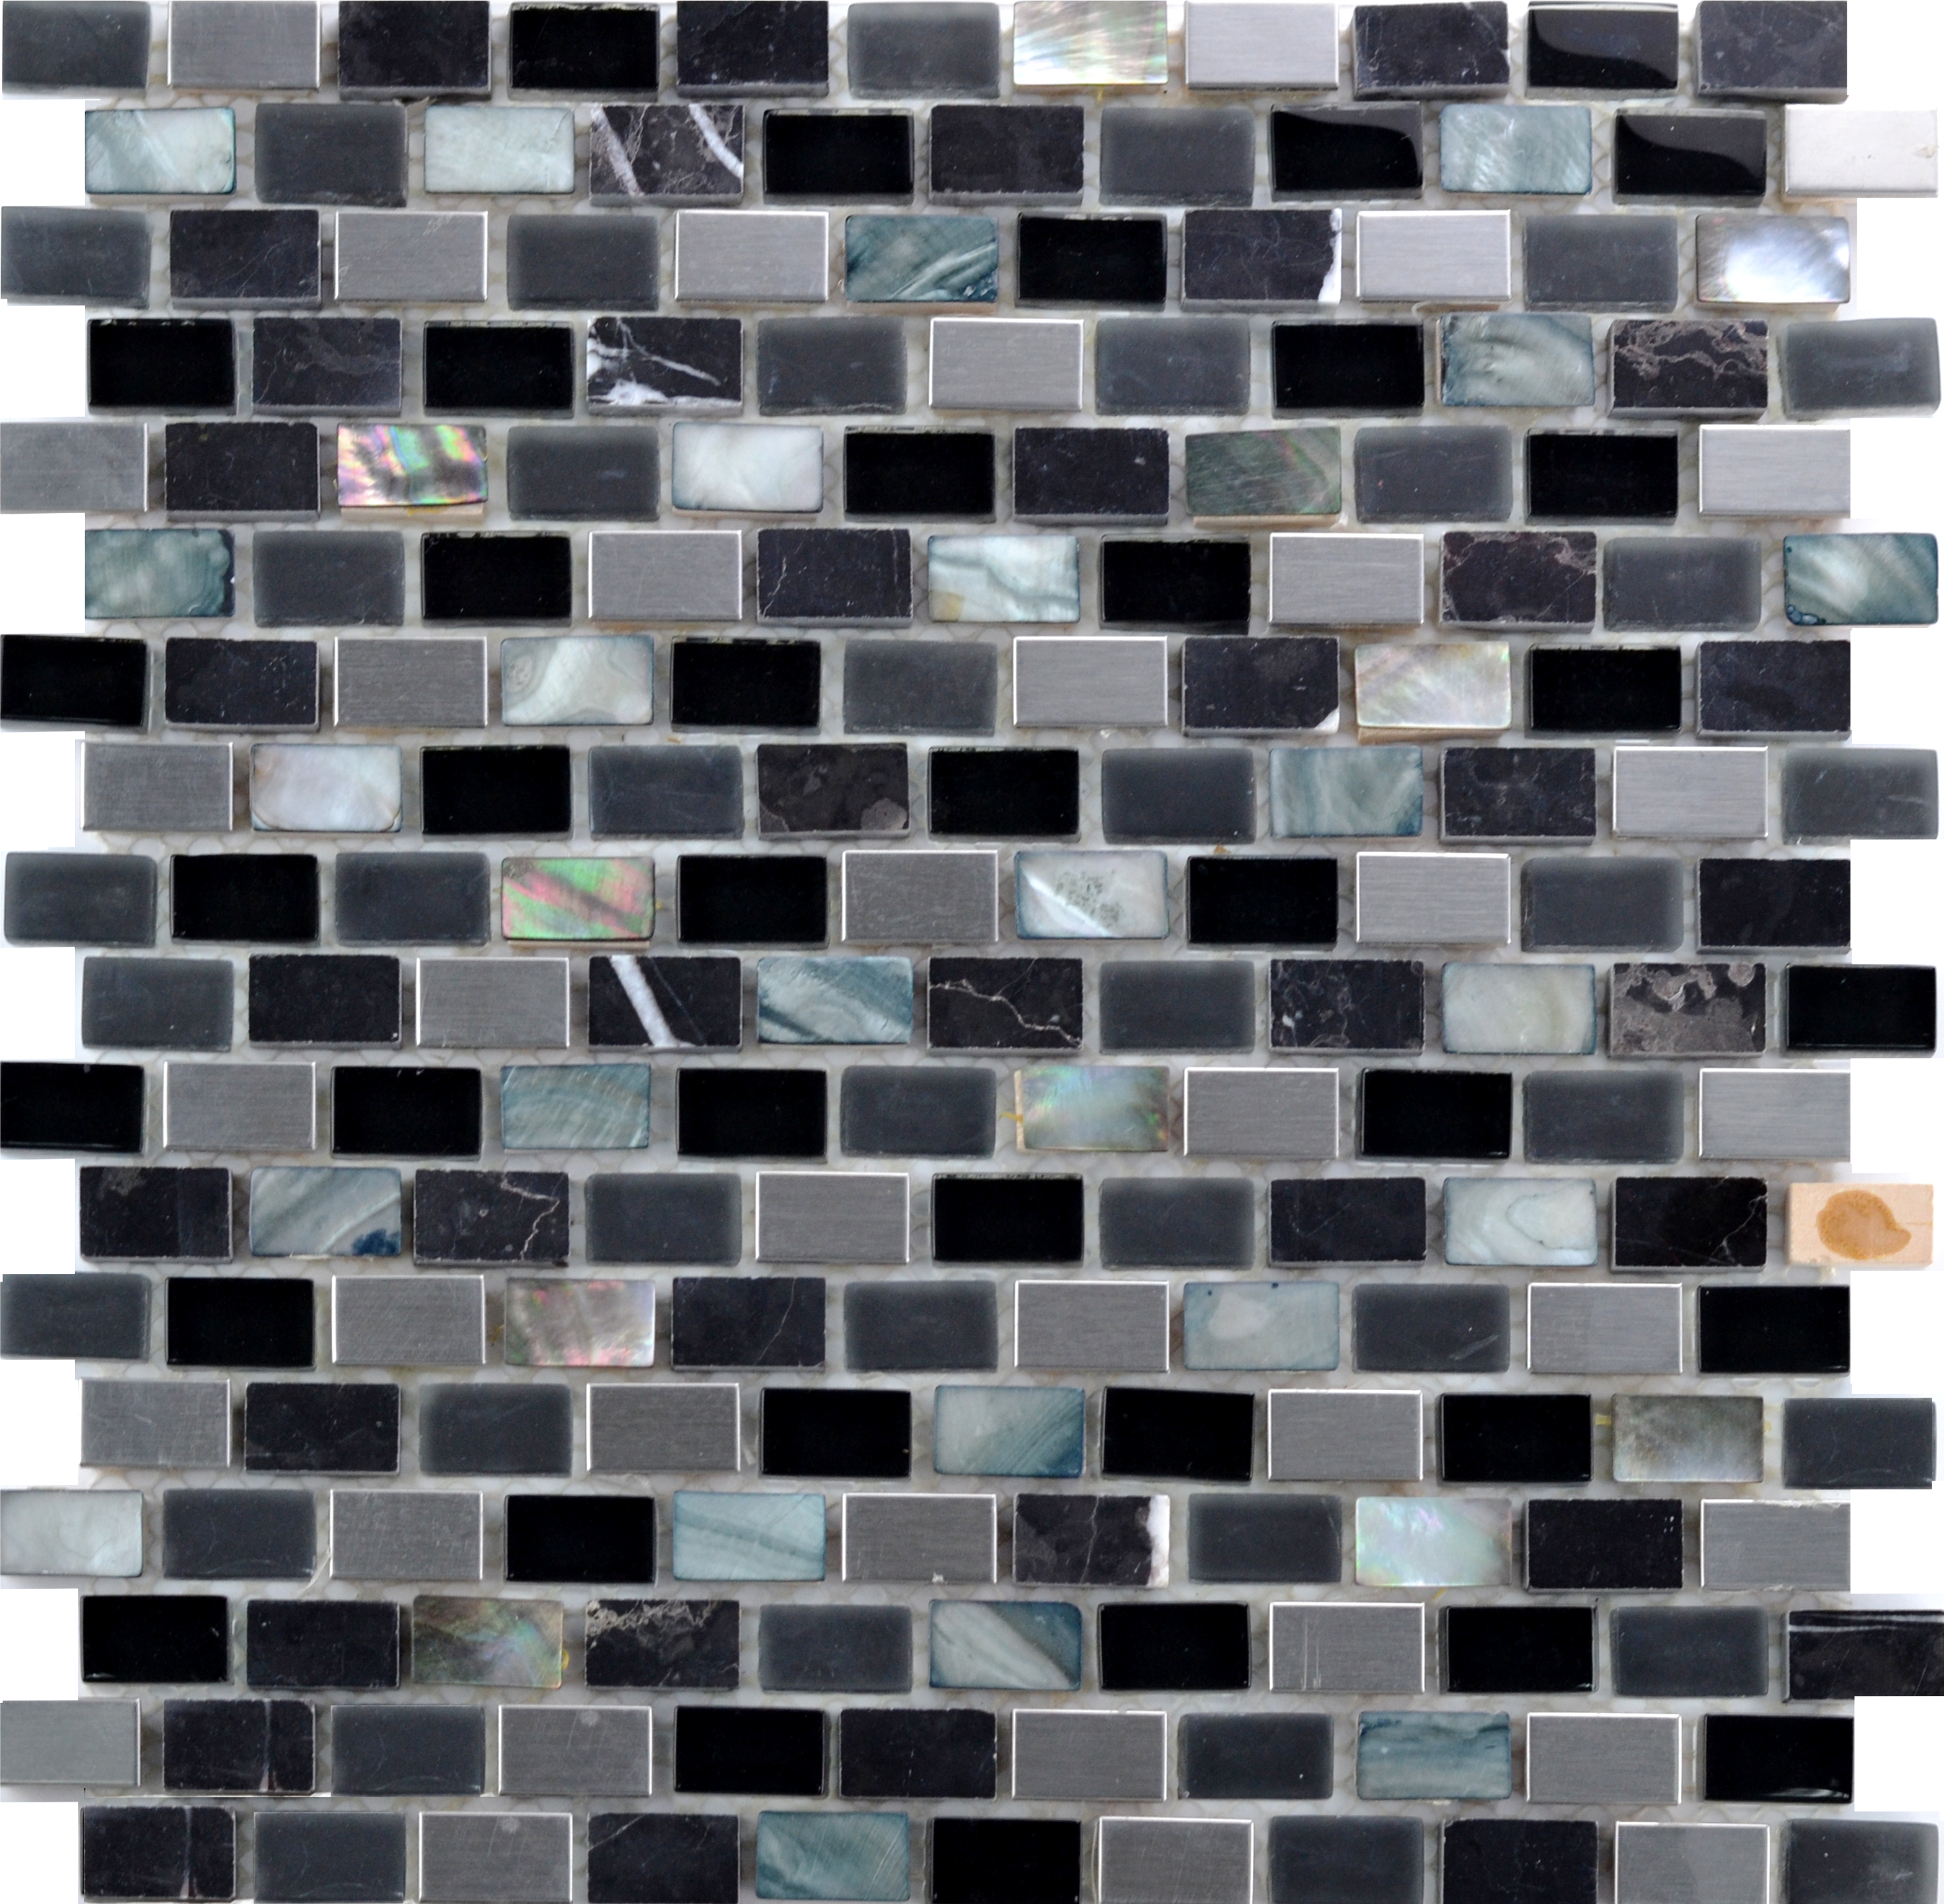 Cinque Glana Schwarz/Metall be-PML088 Mosaik 30x30